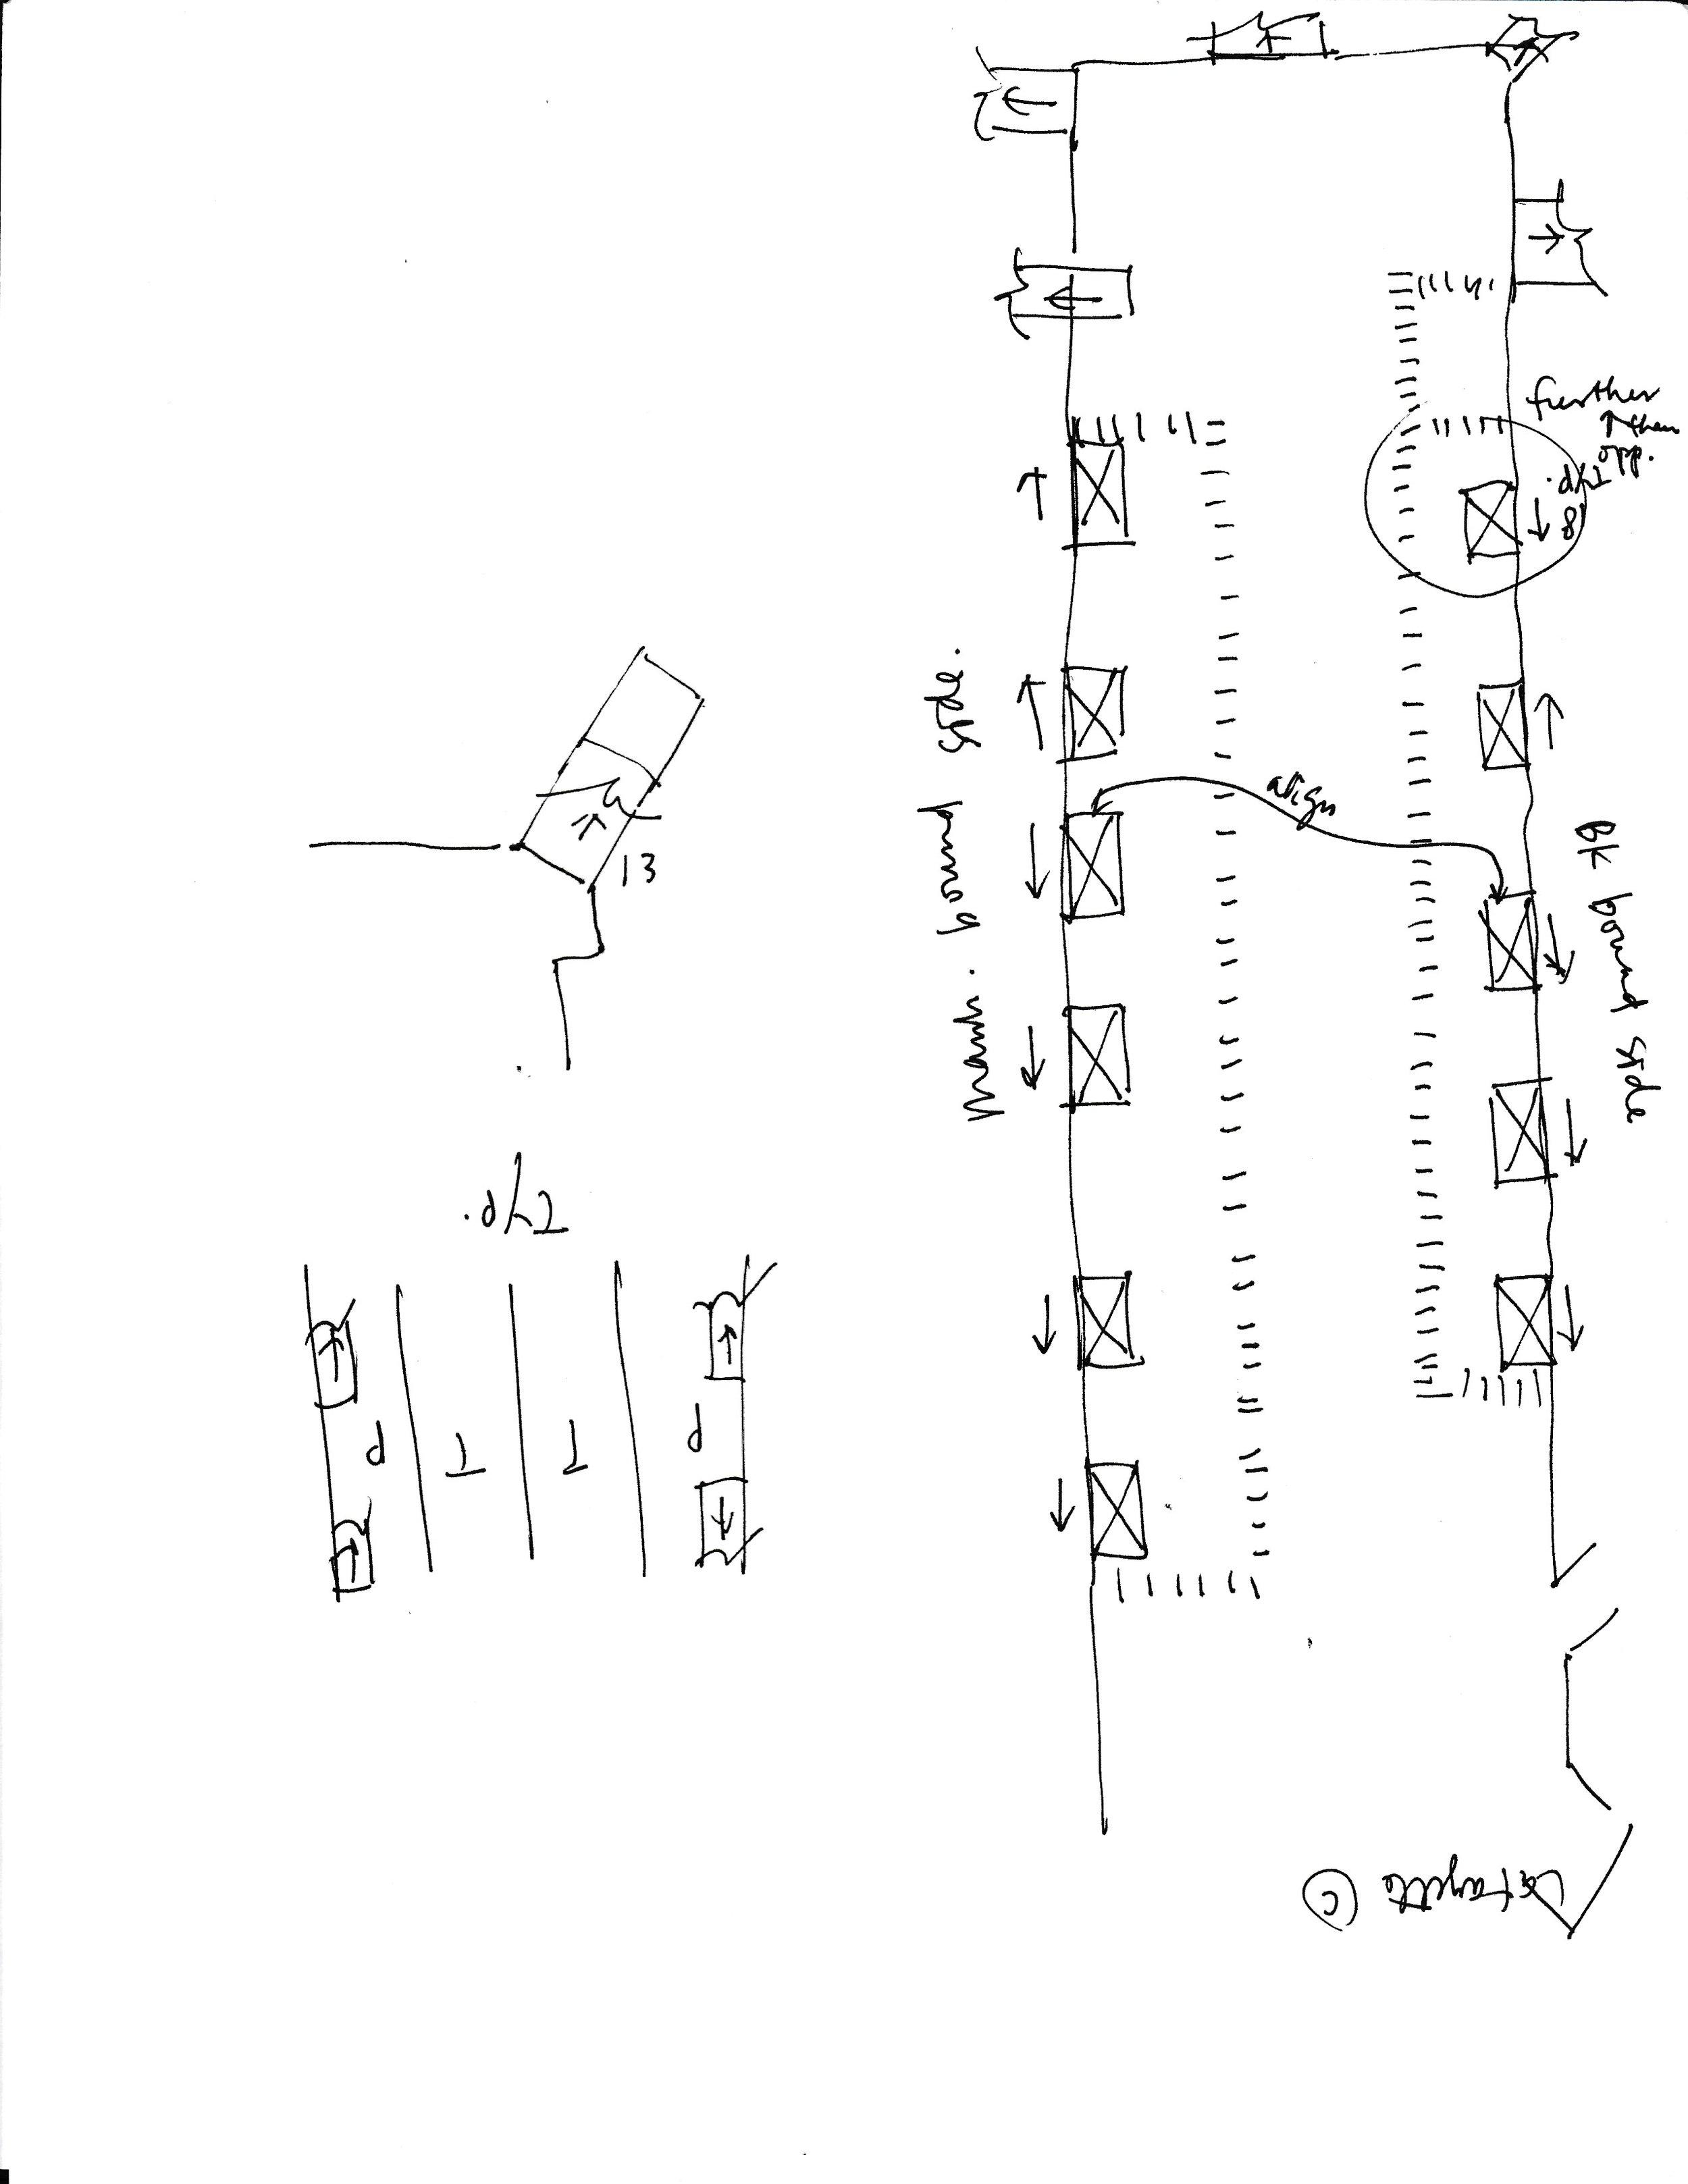 A fairly rectangular mezzanine